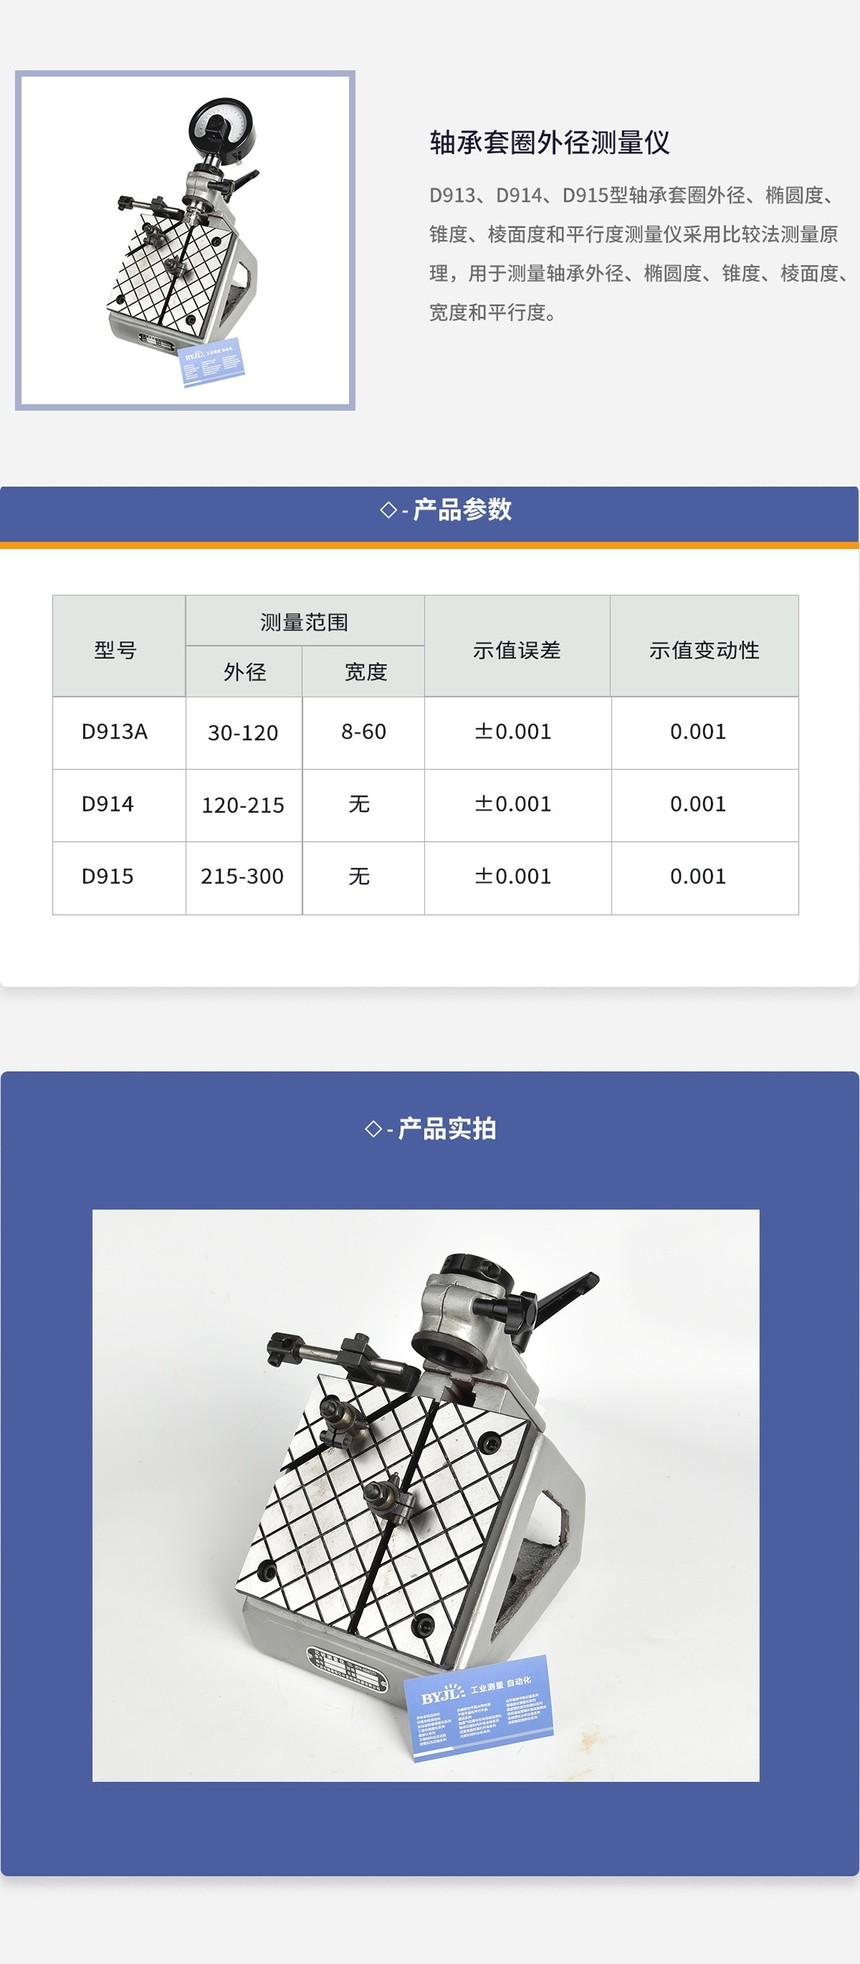 D913A、D914、D915轴承套圈外径测量仪.jpg